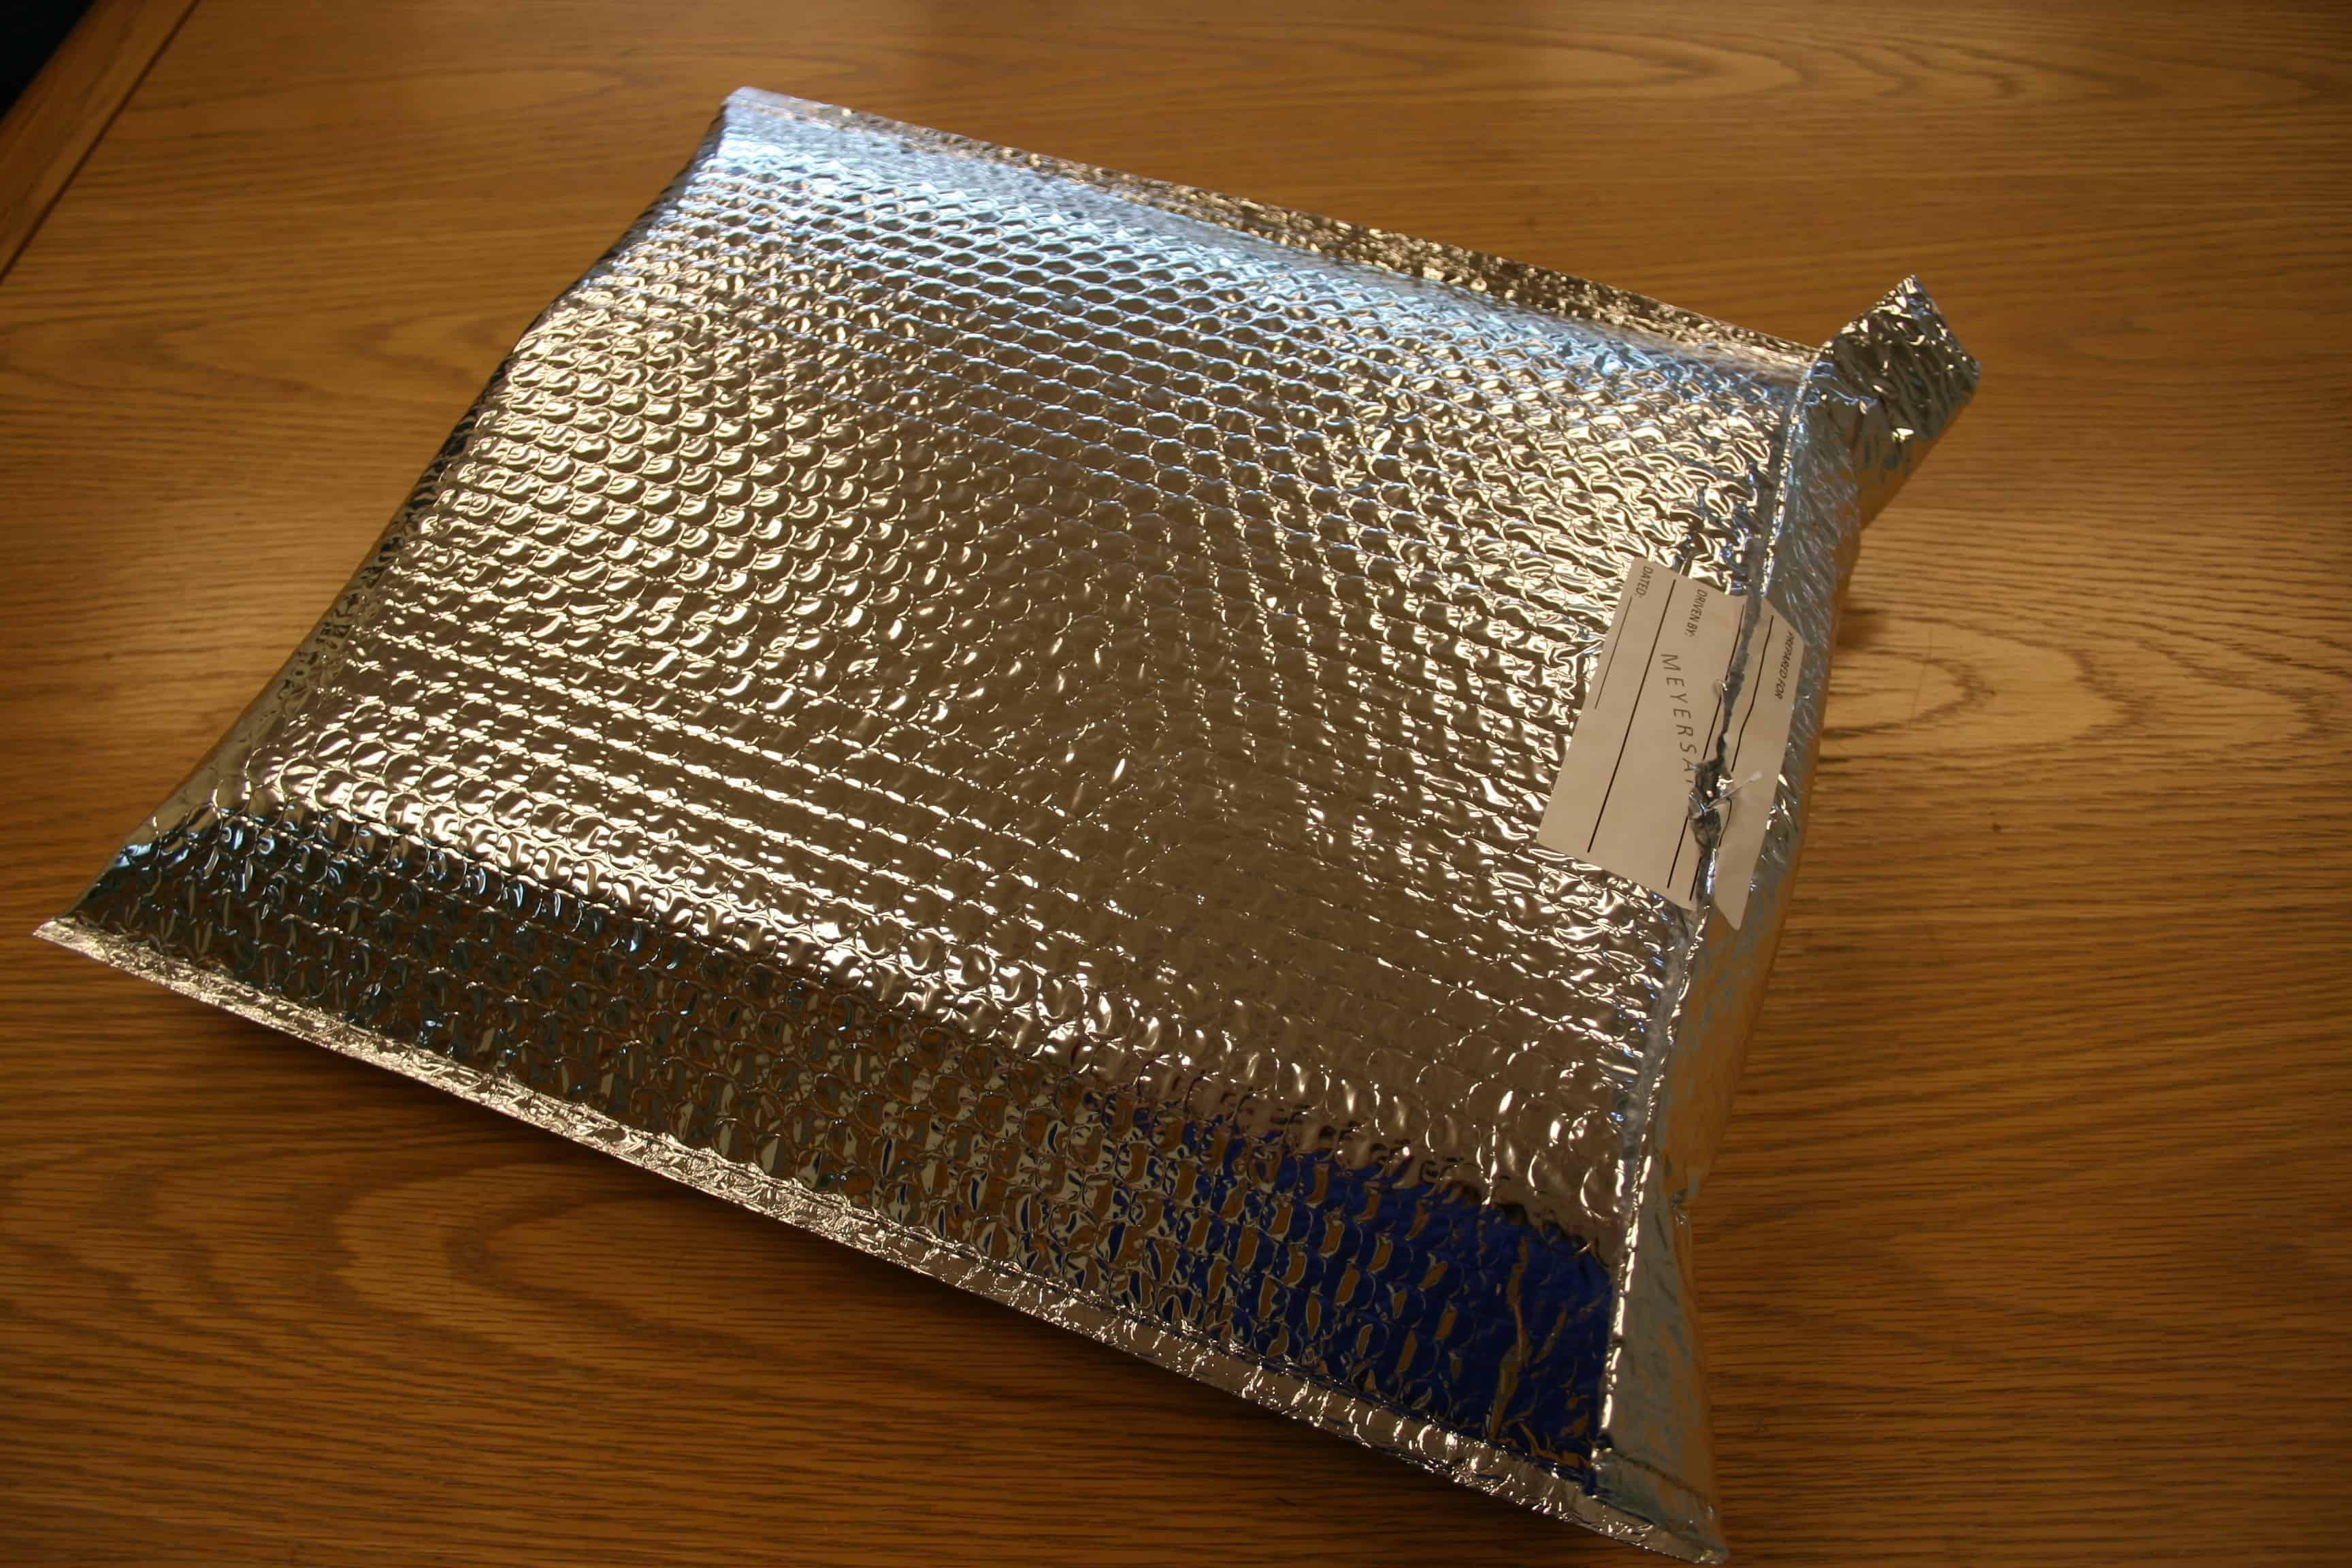 MeyerSafe™ security packaging